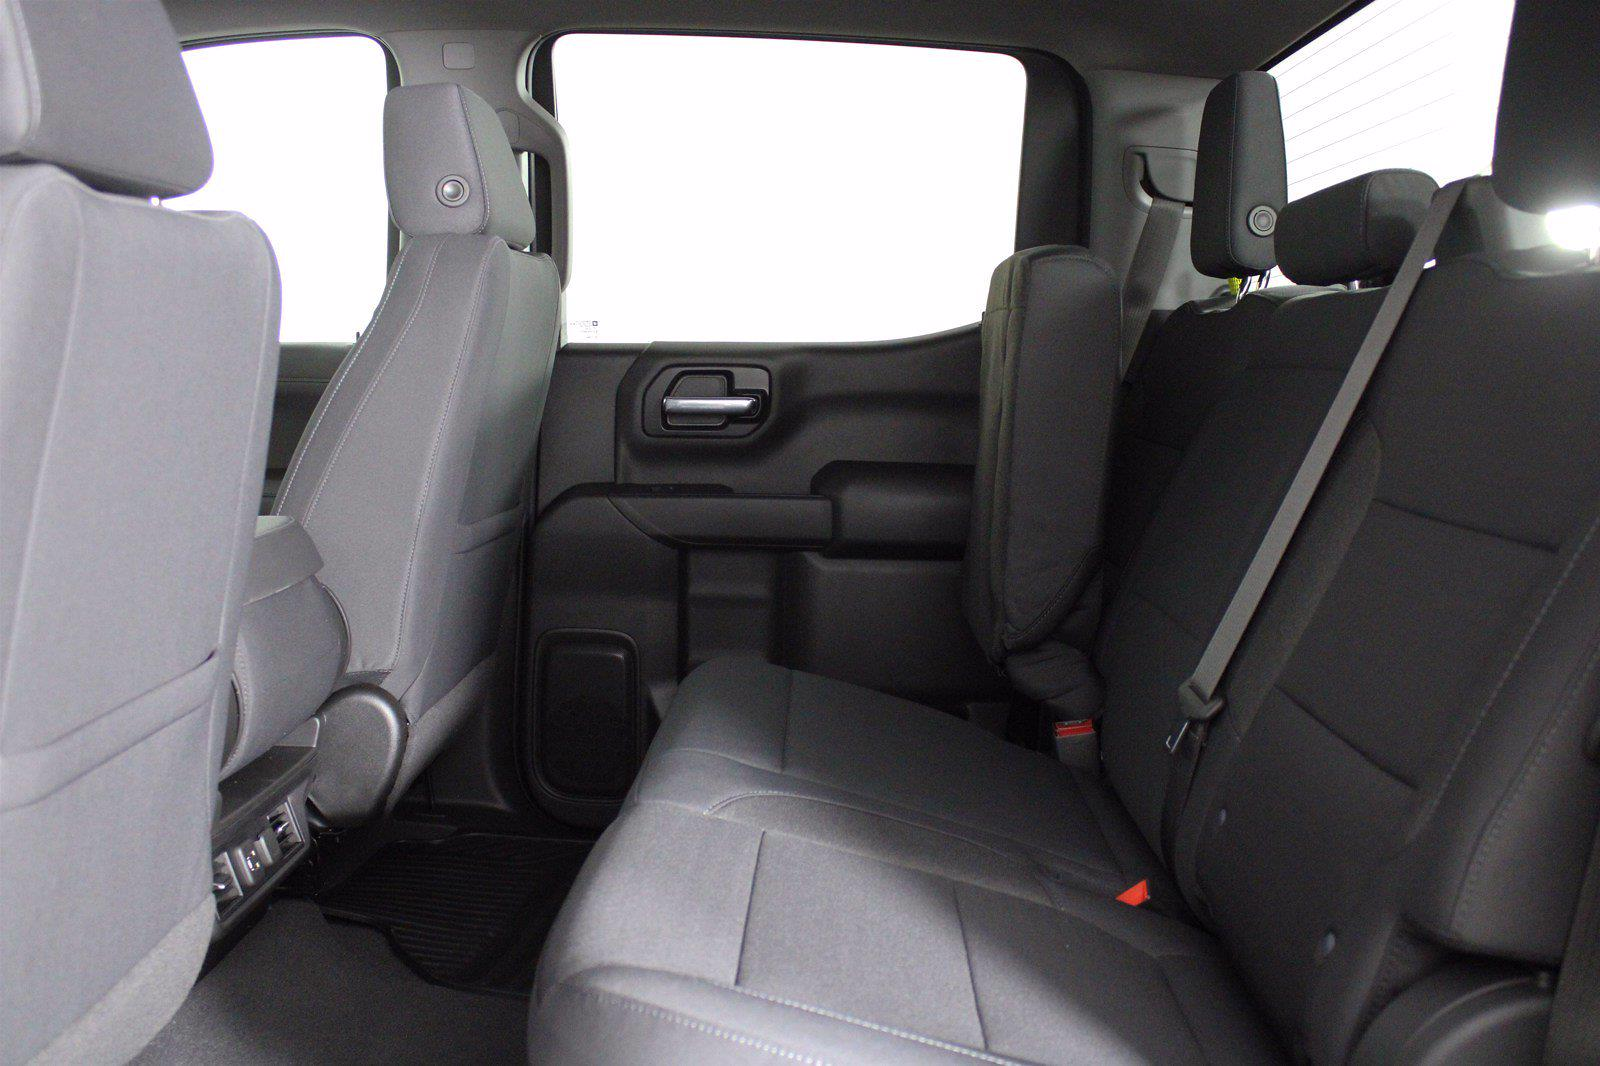 2021 Chevrolet Silverado 1500 Crew Cab 4x4, Pickup #D110896 - photo 16